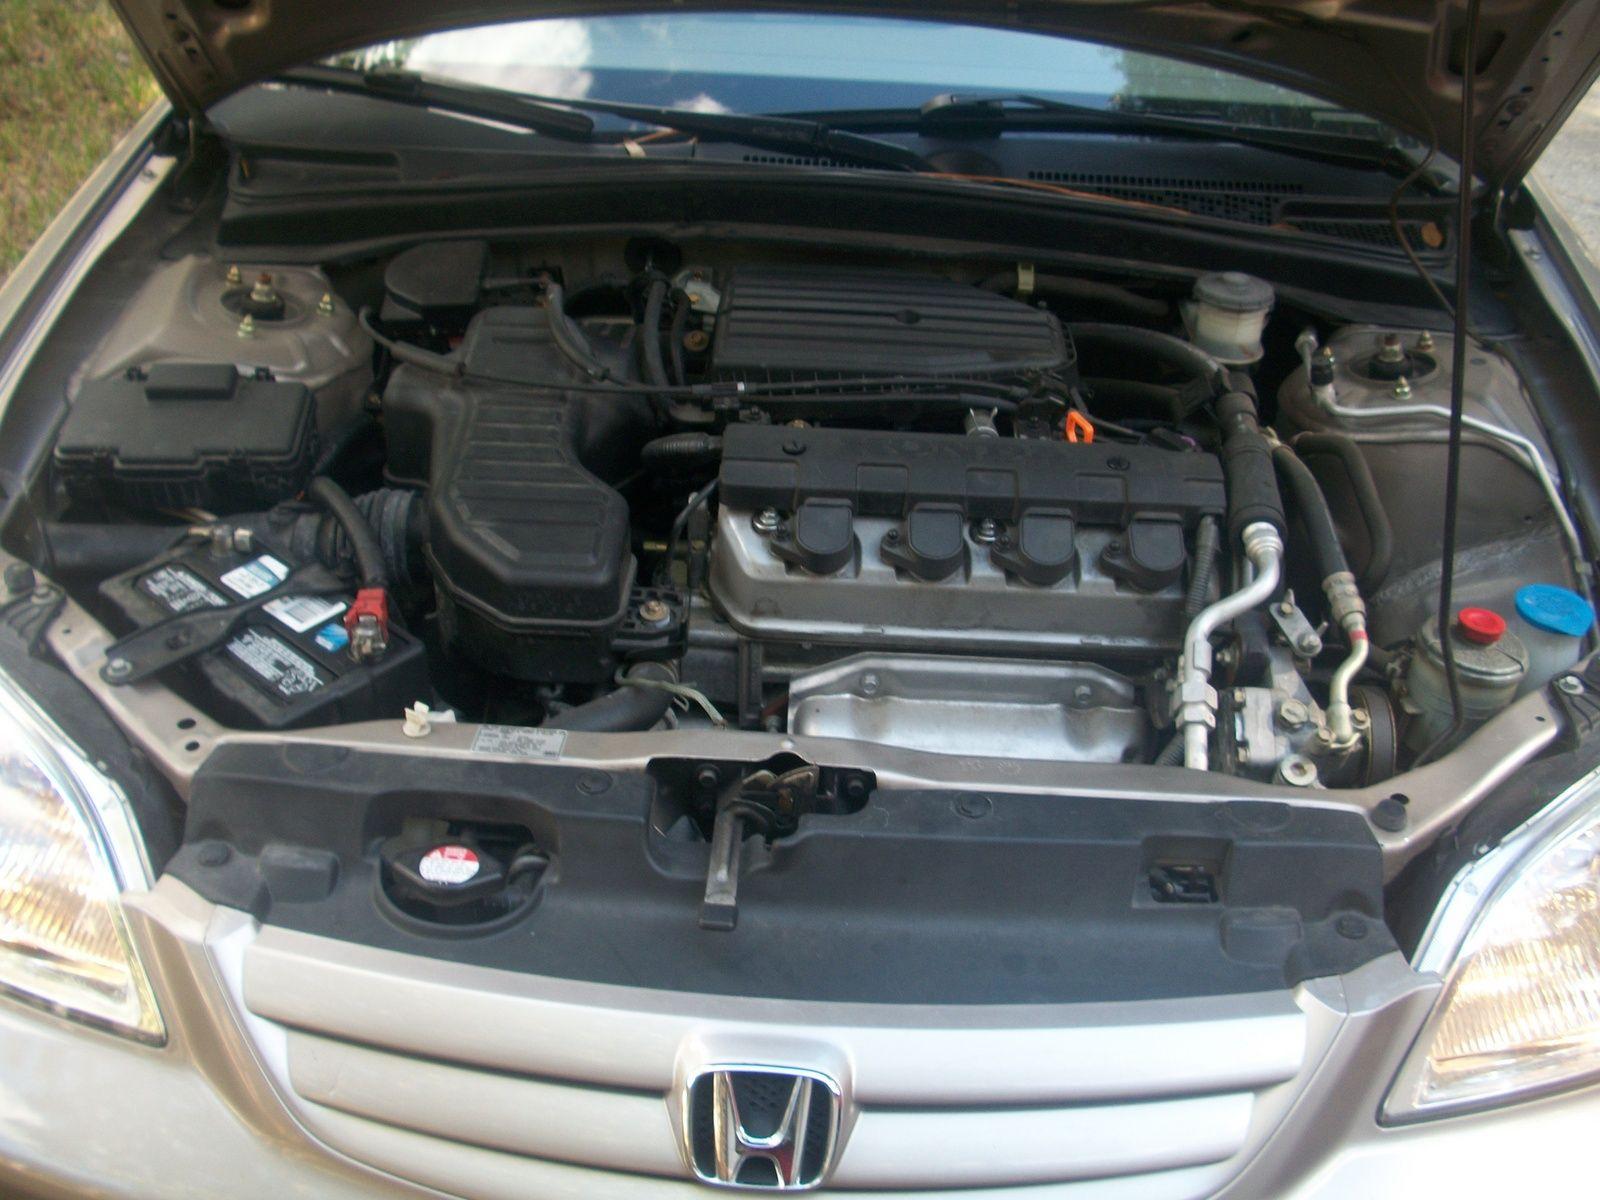 2002 Honda Civic Gas Engine 2.0L (DX, EX, GX, HX,